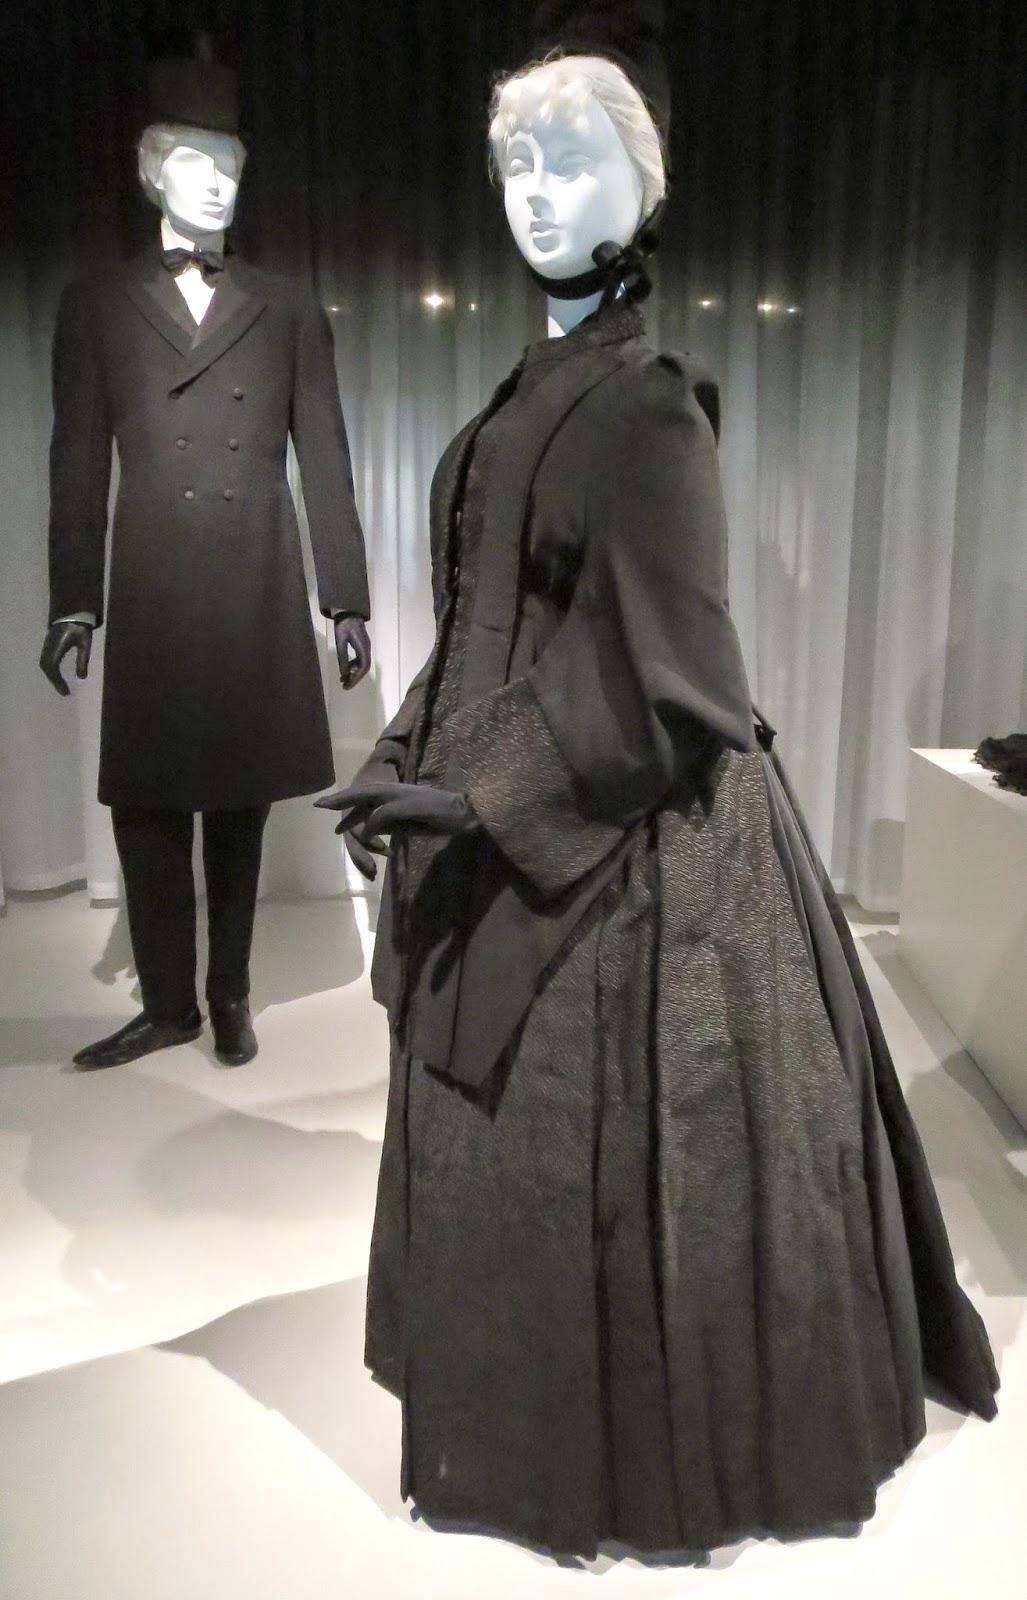 Idiosyncratic Fashionistas: GOOD MOURNING